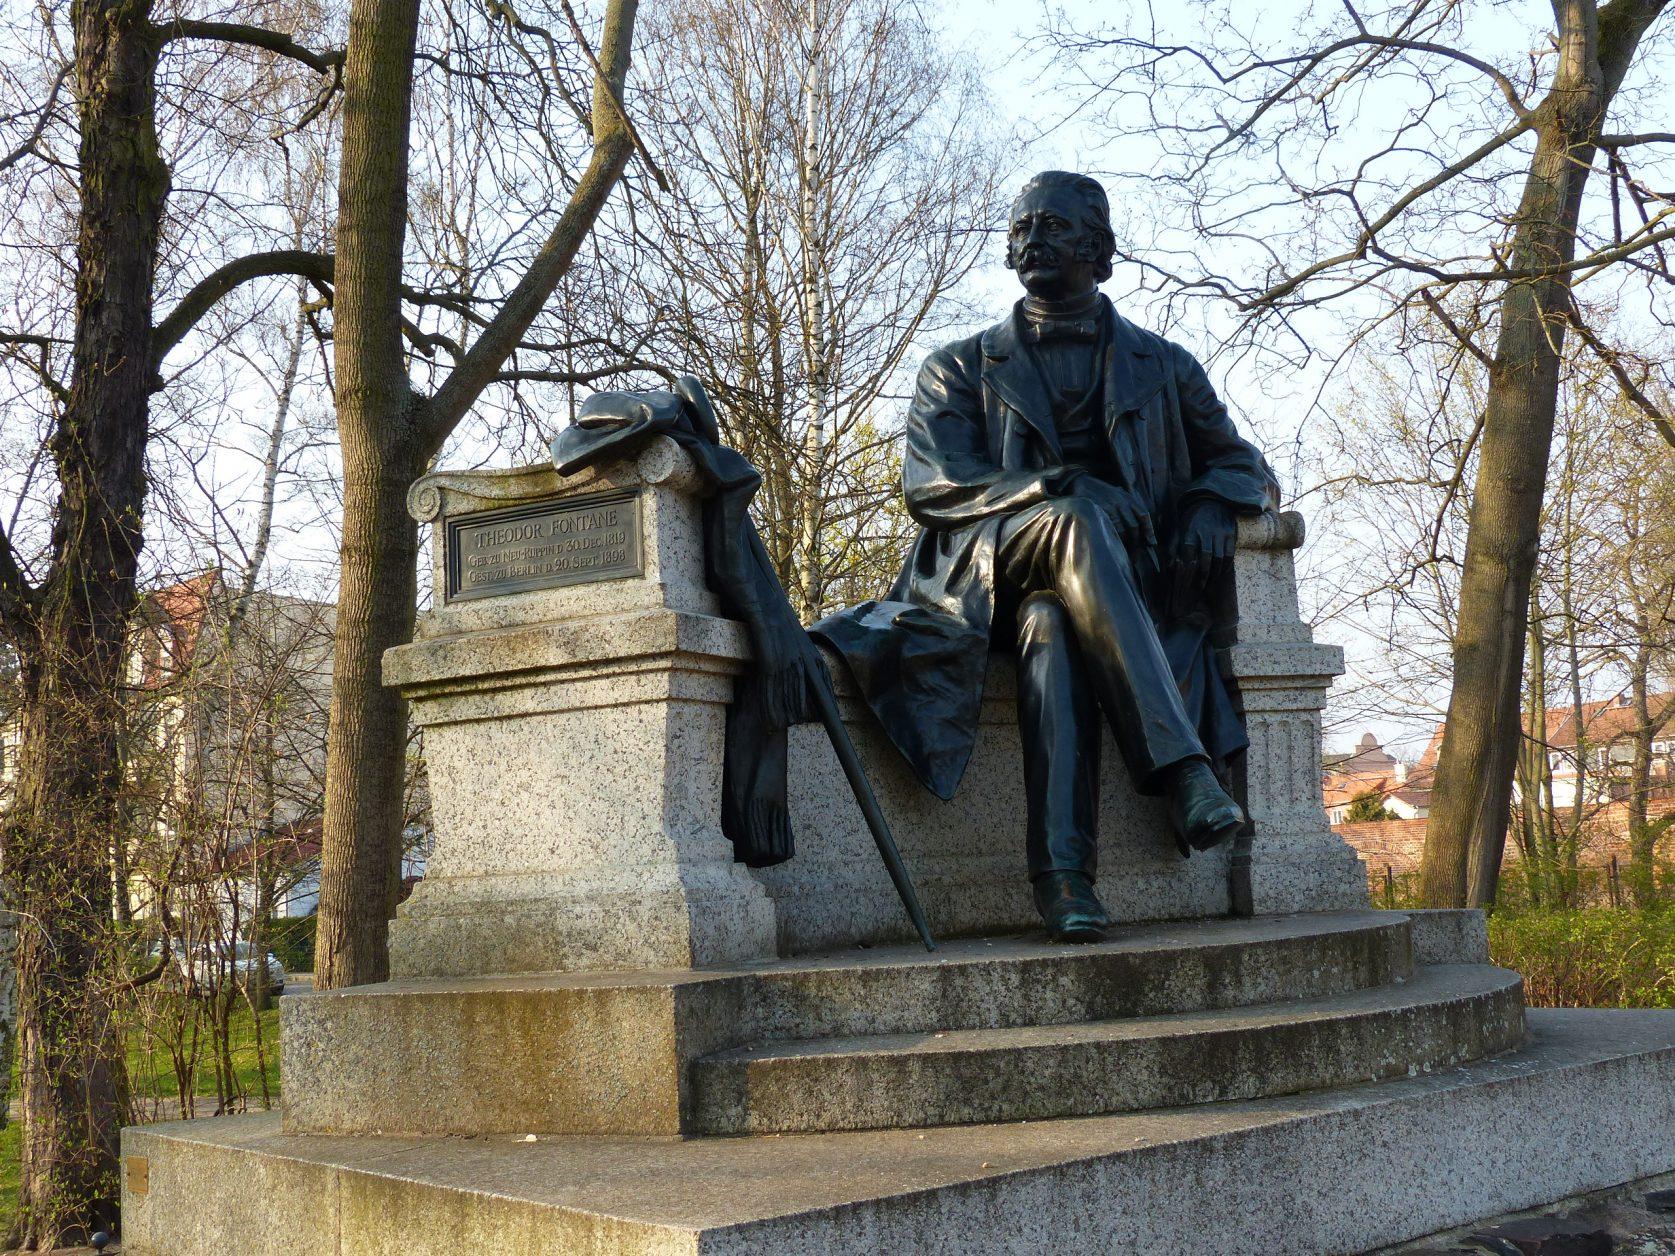 Hier das Denkmal Theodor Fontane in Neuruppin, Foto: D.Weirauch